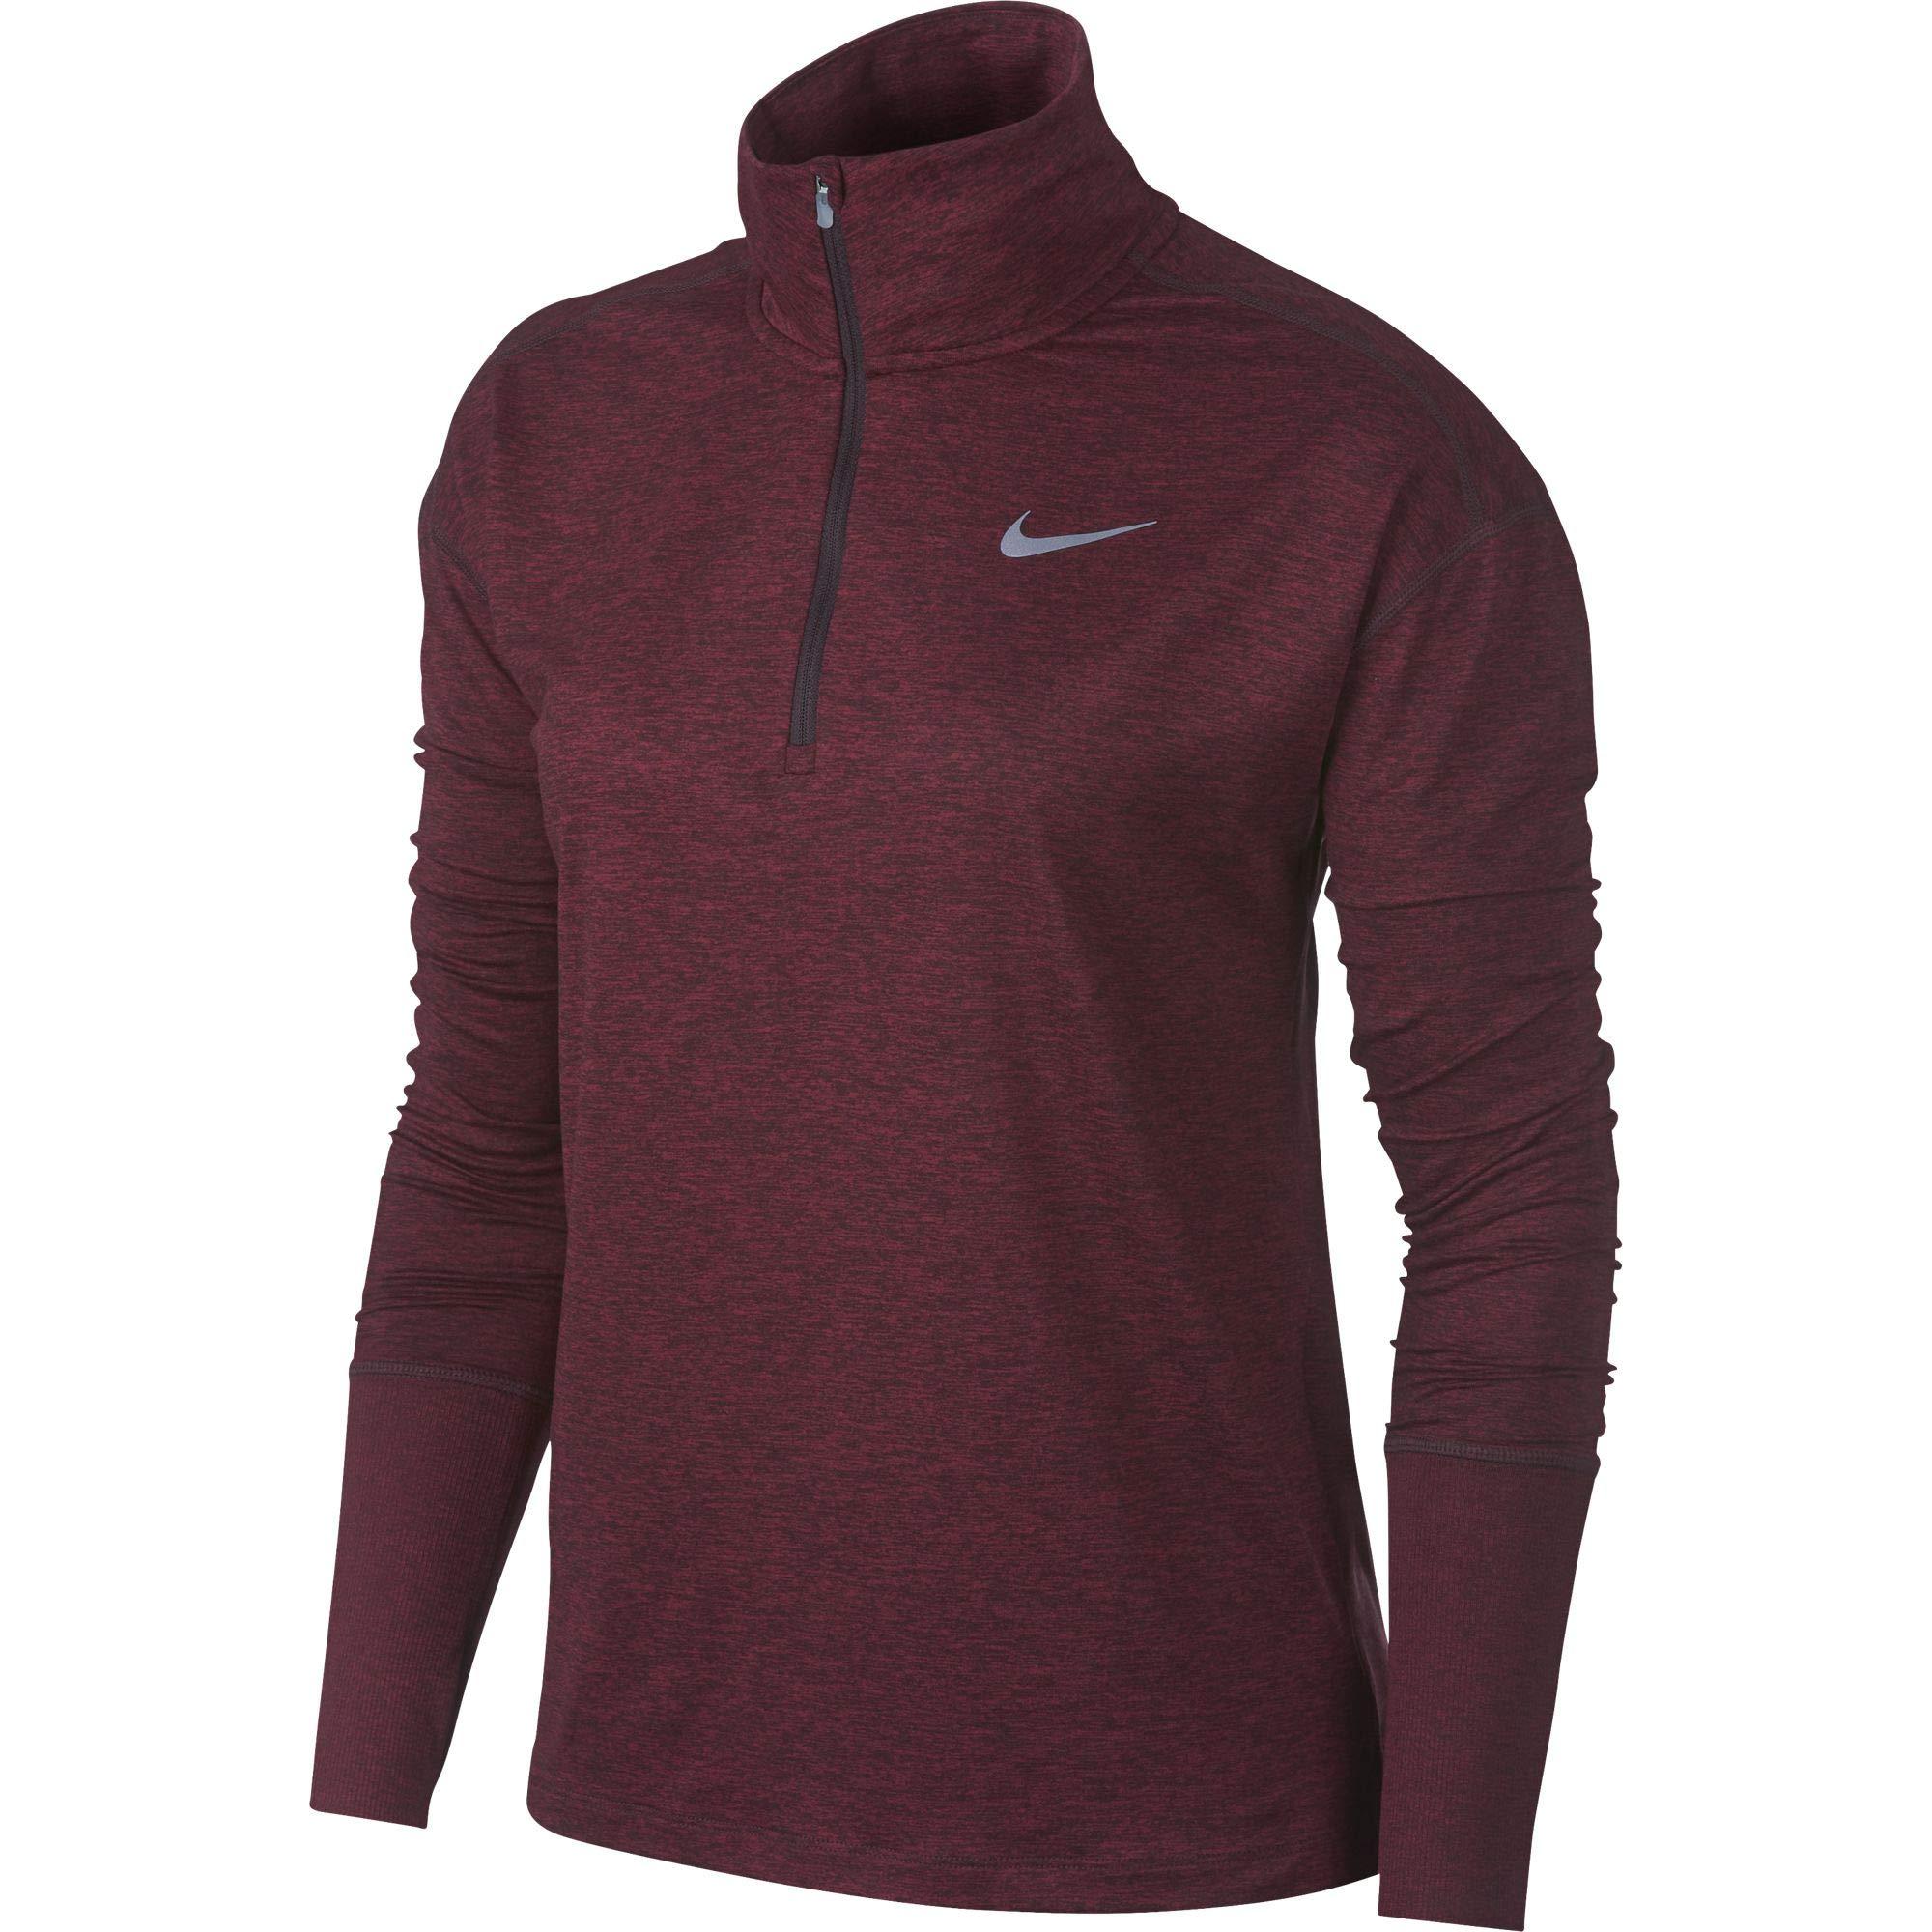 Nike Women's Element 1/2 Zip Running Top Burgundy Crush/Red Crush/Heather Size Small by Nike (Image #1)